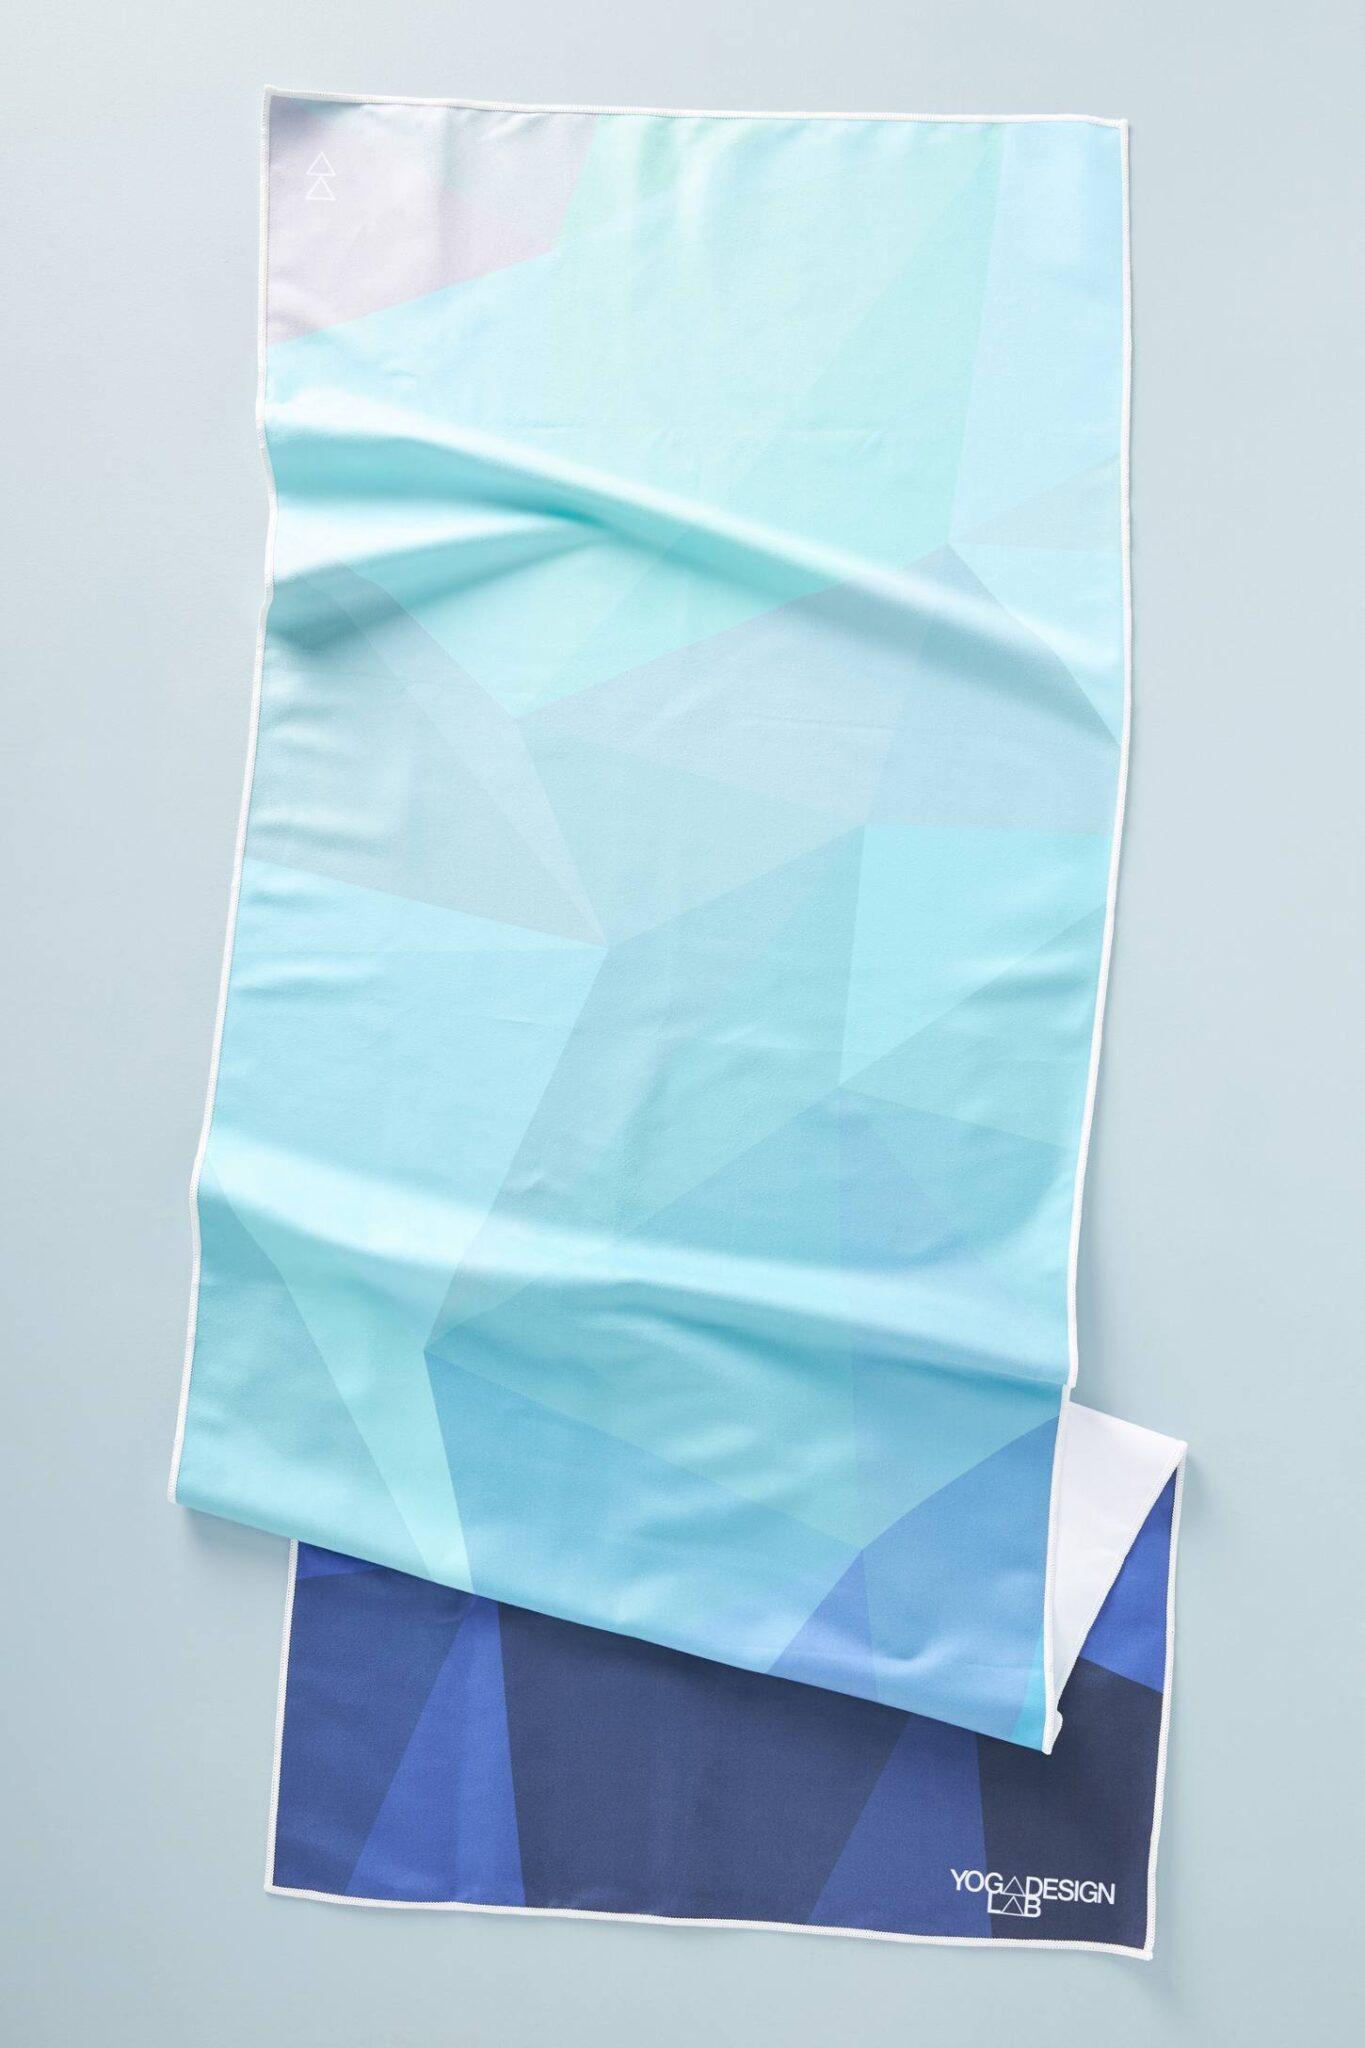 Yoga Design Lab Yoga Mat Towel $44.00